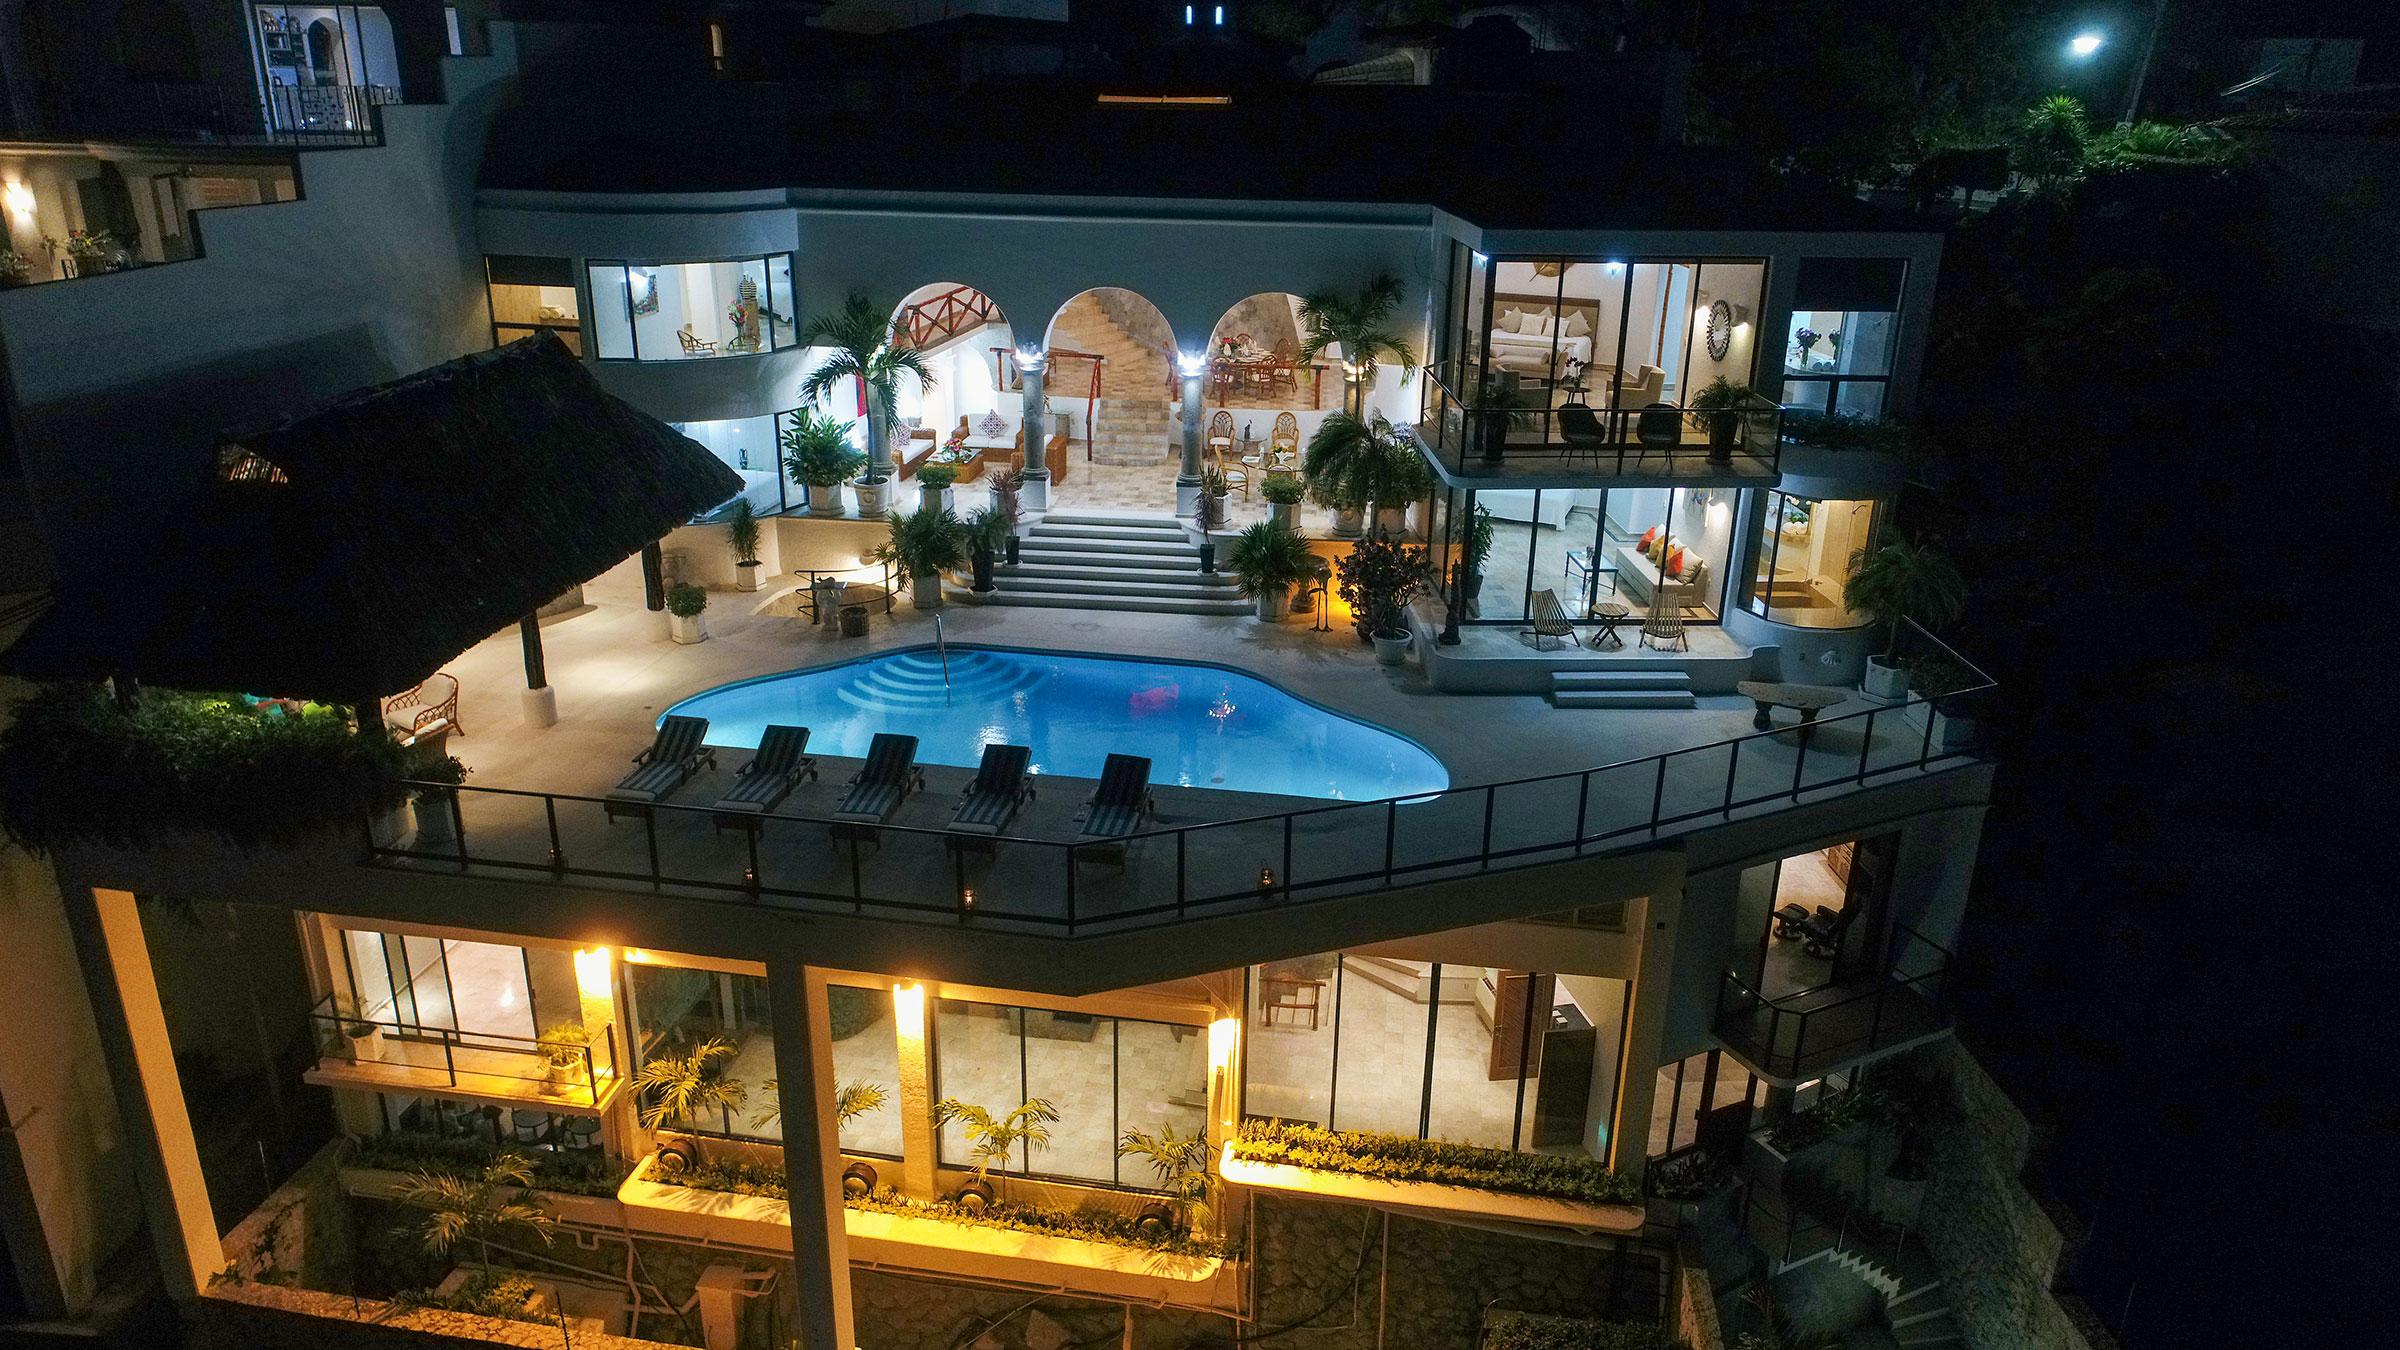 Exterior night at Casa Buenos Aires, Acapulco